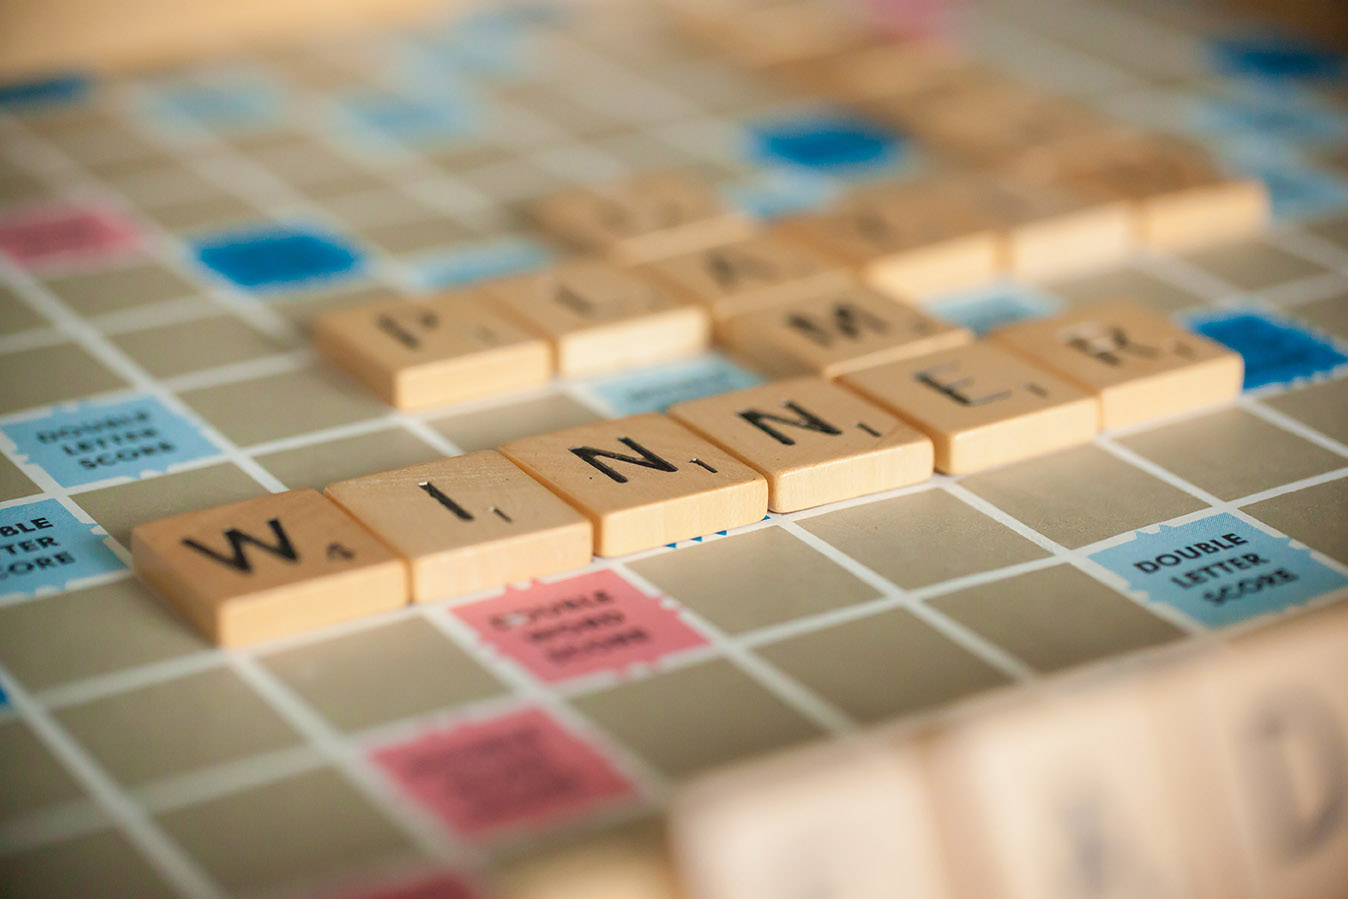 scrabble titles on a game board fftranscription